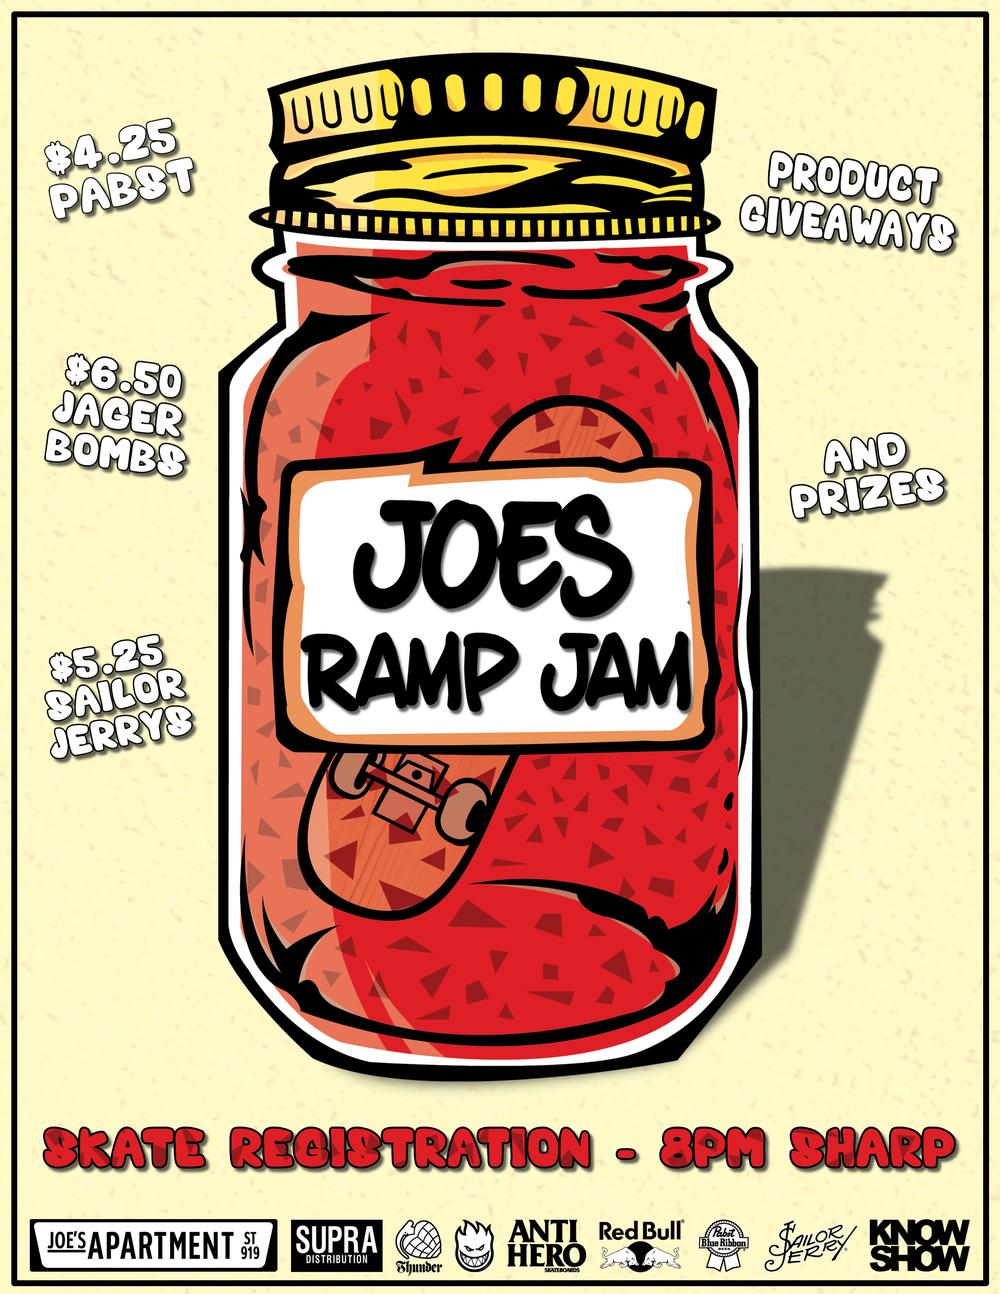 joes-ramp-jam.png